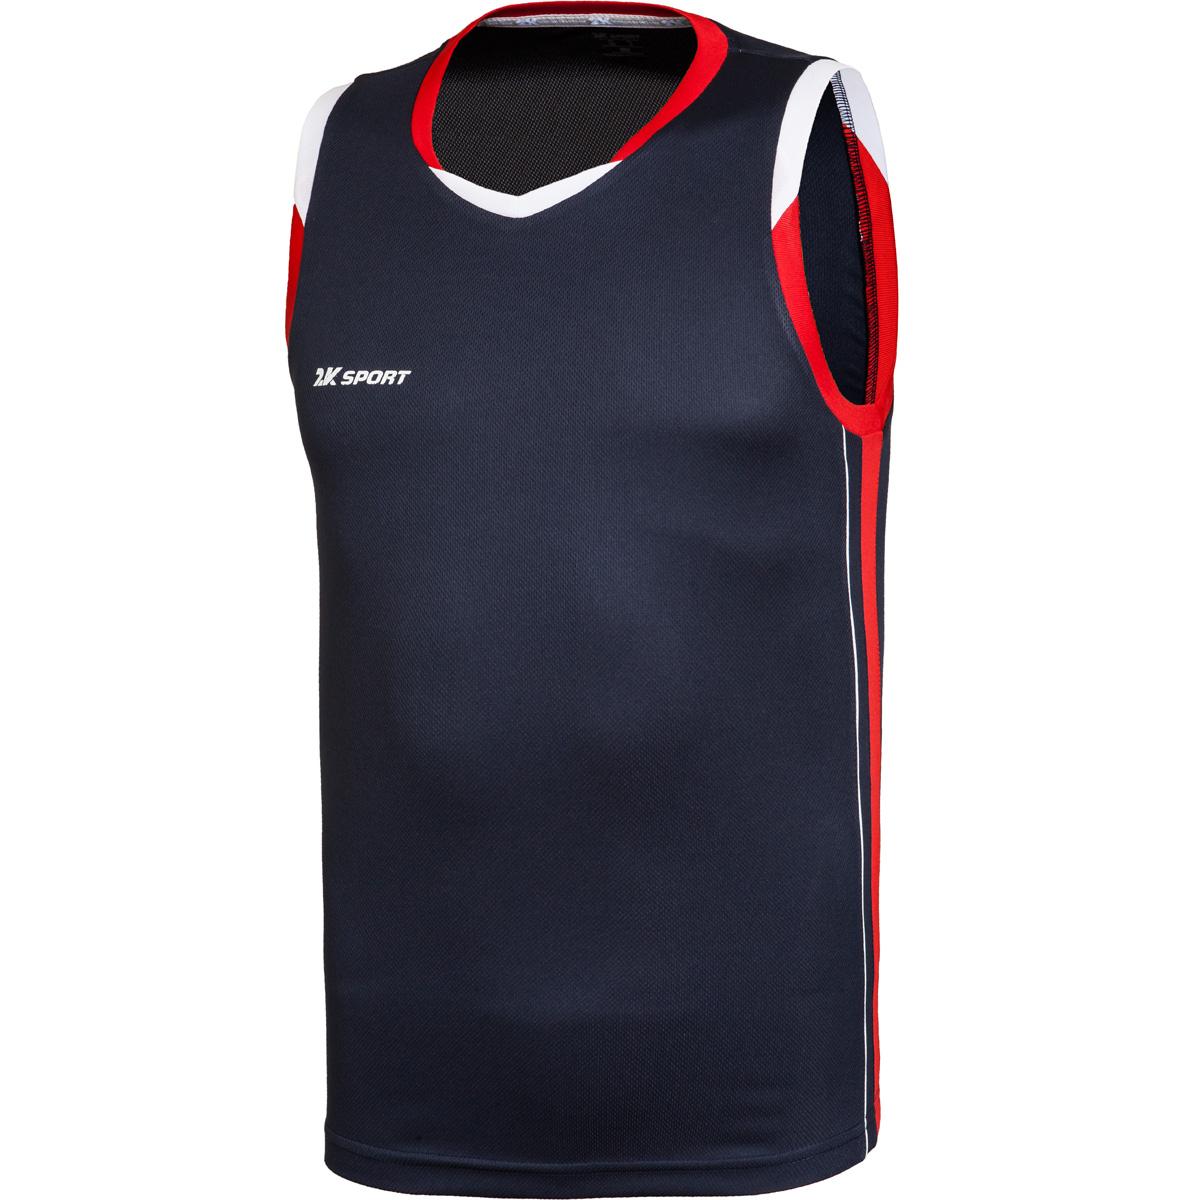 Майка баскетбольная мужская 2K Sport Advance, цвет: темно-синий, красный, белый. 130030. Размер XL (52) - Баскетбол